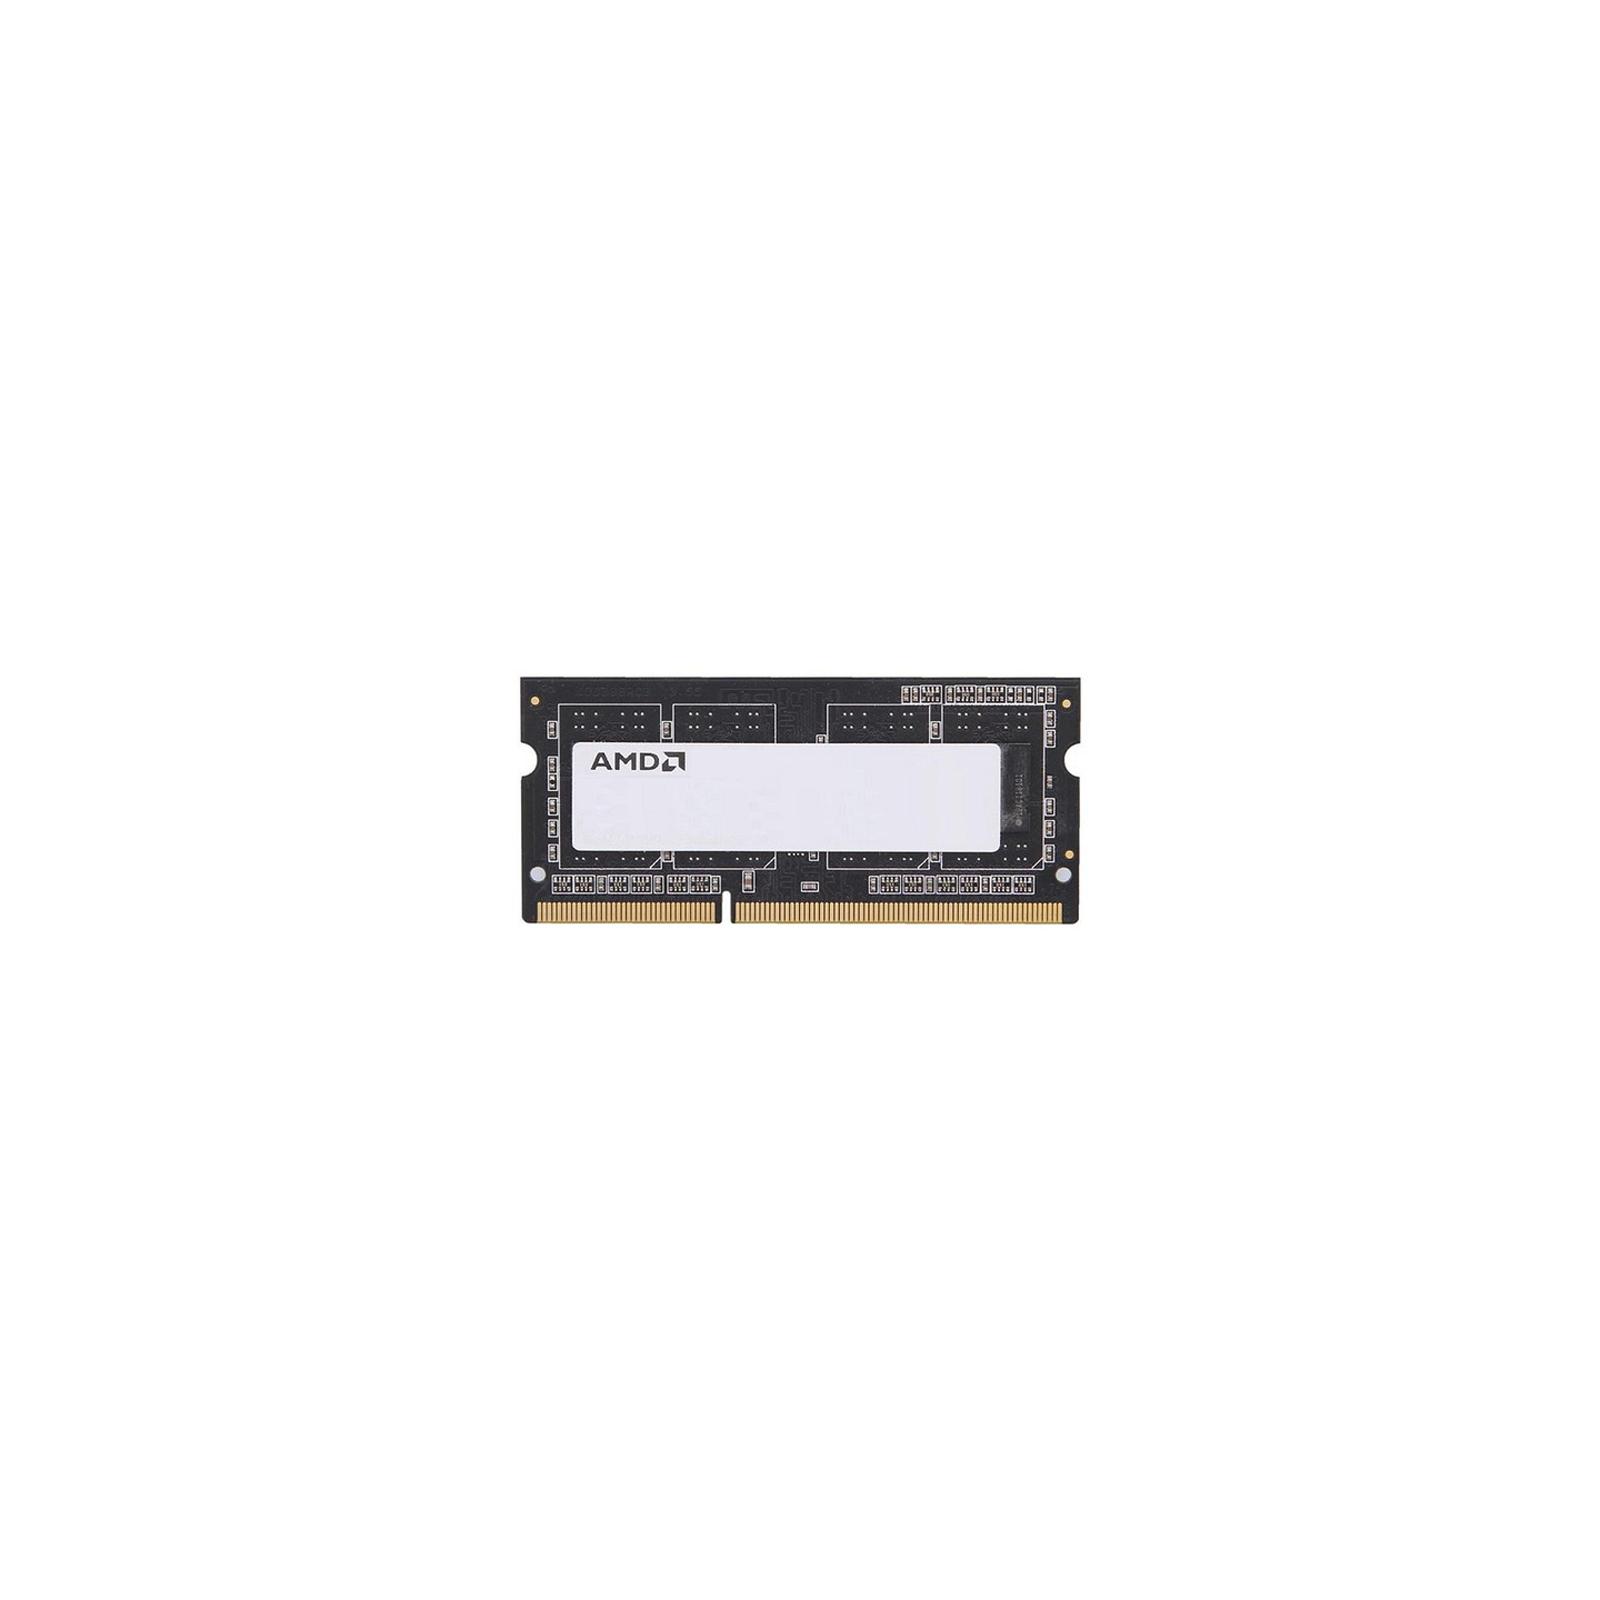 Модуль памяти для ноутбука SoDIMM DDR3L 8GB 1600 MHz AMD (R538G1601S2SL-UOBULK)